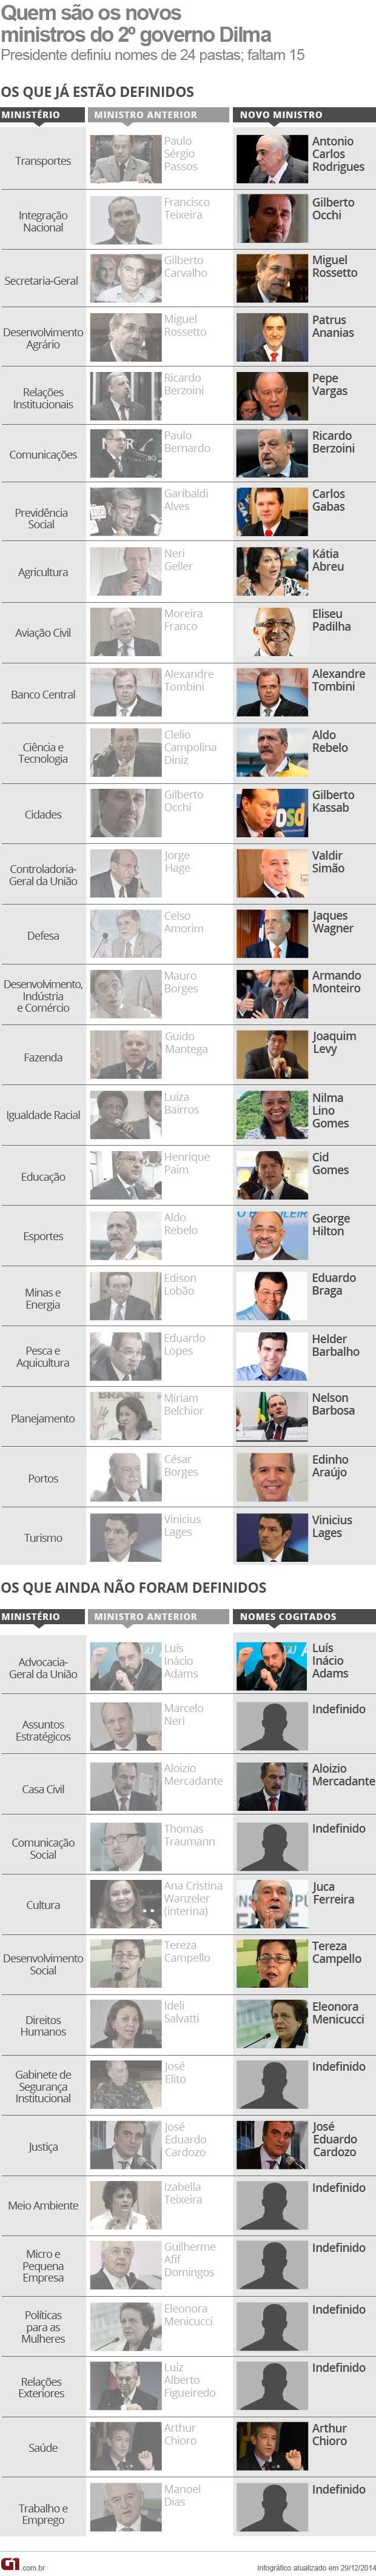 Arte ministros segundo mandato governo Dilma / VALE ESTA (Foto: Editoria de Arte / G1)